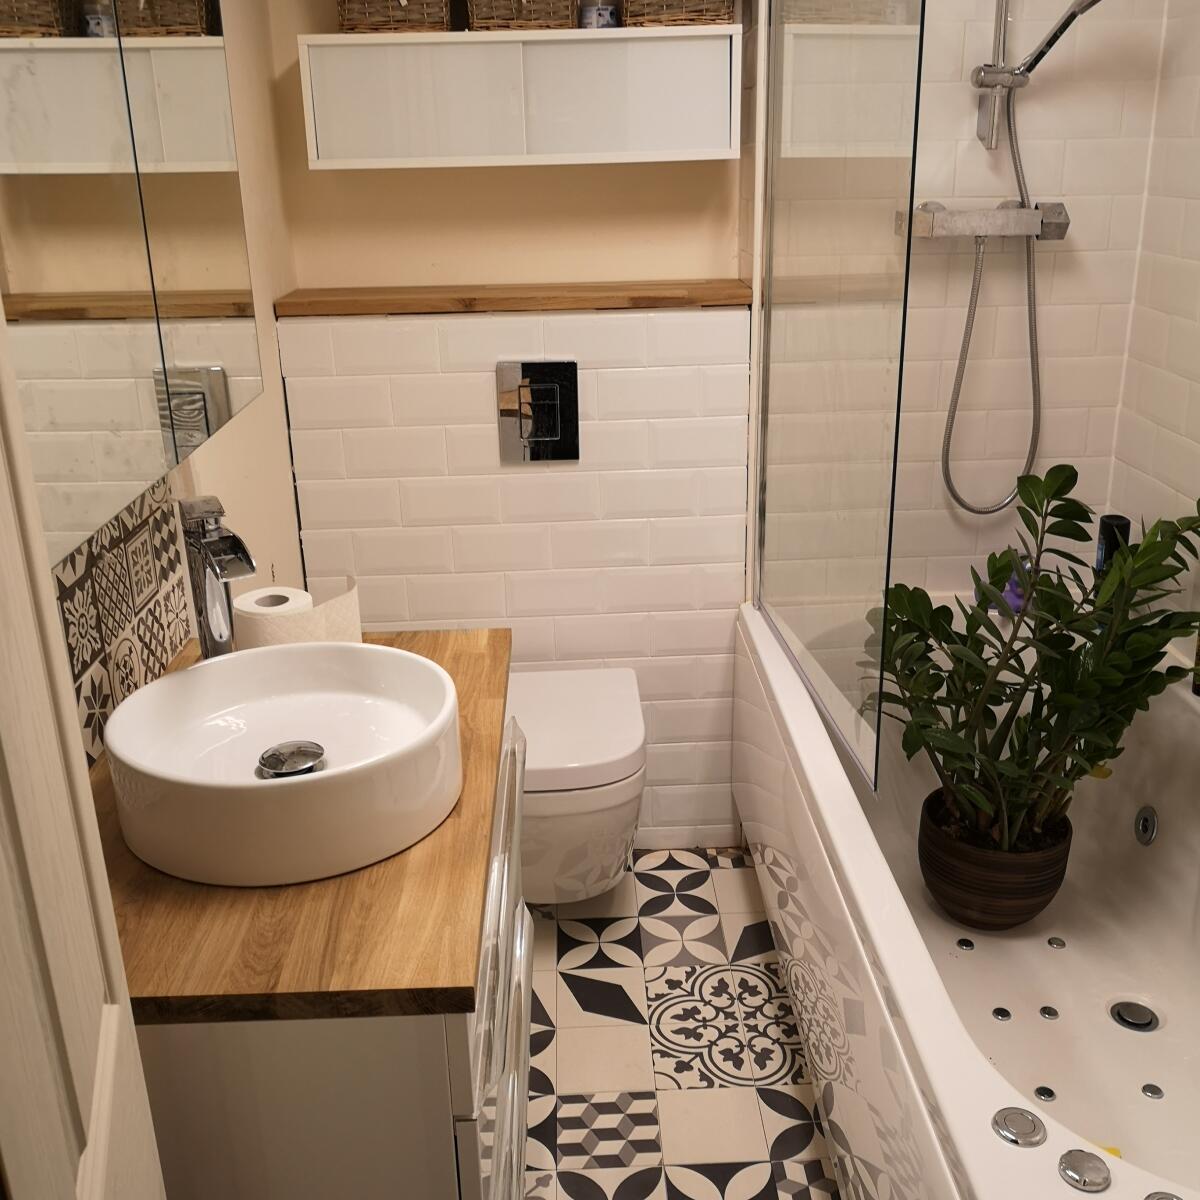 The Whirlpool Bath Shop Reviews - Read 622 Genuine Customer Reviews ...